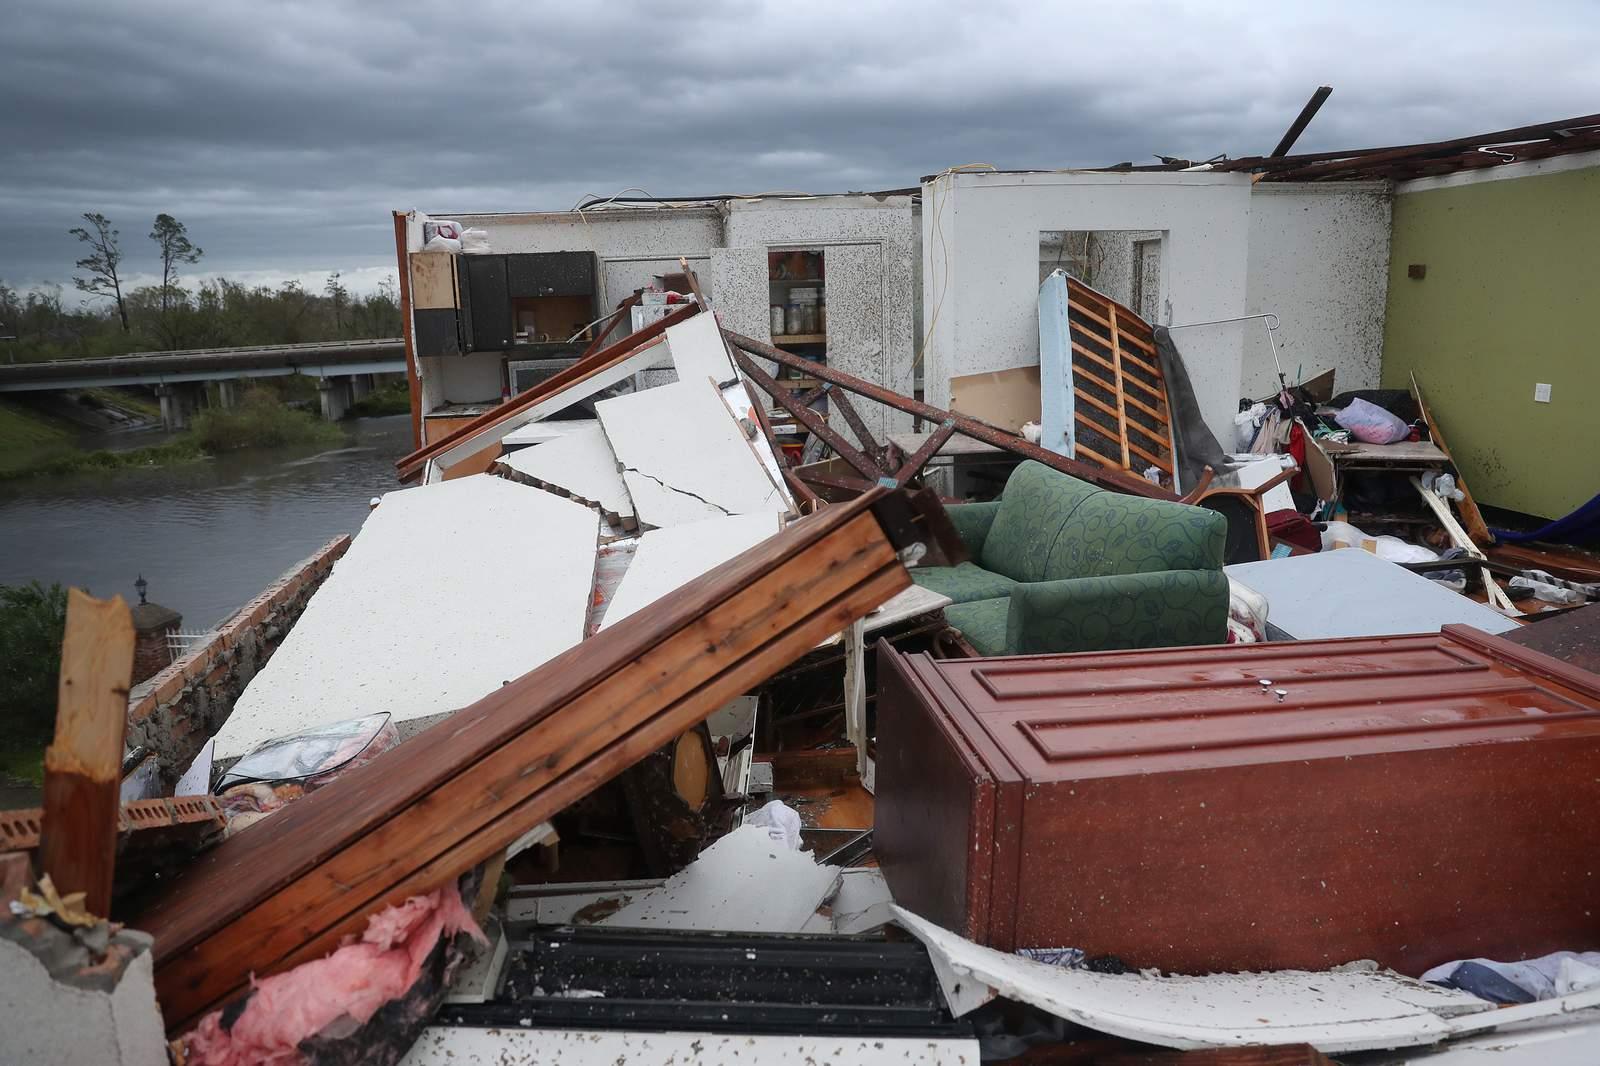 2020 Lake Charles Civic Center Kids Halloween 2020 WATCH: 10 destruction videos that show Hurricane Laura's